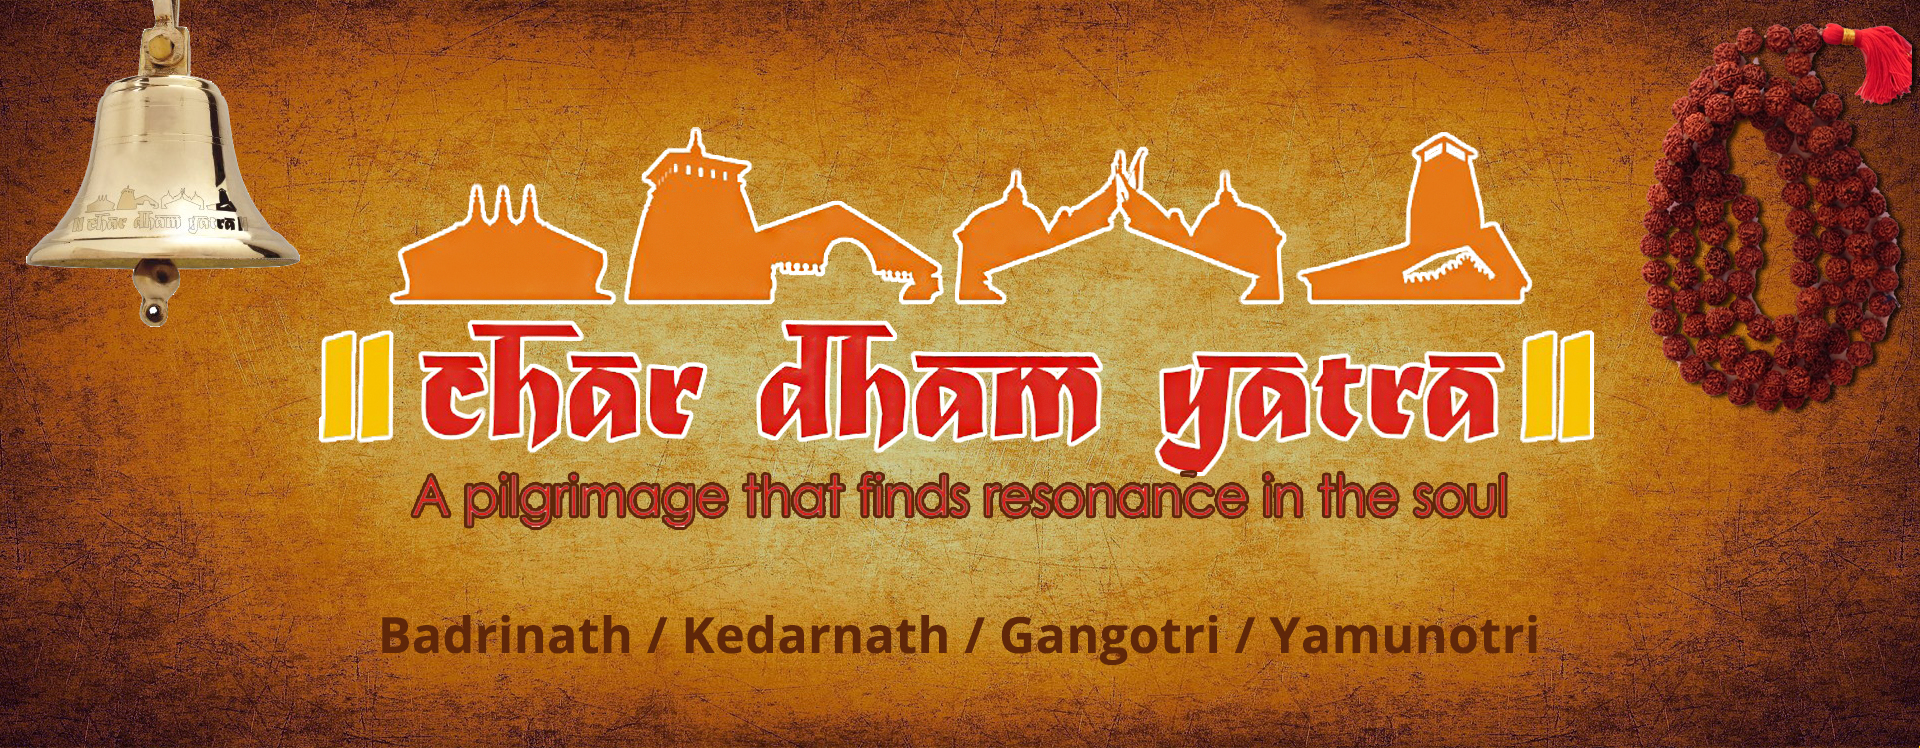 chardham-yatra-banner-new2